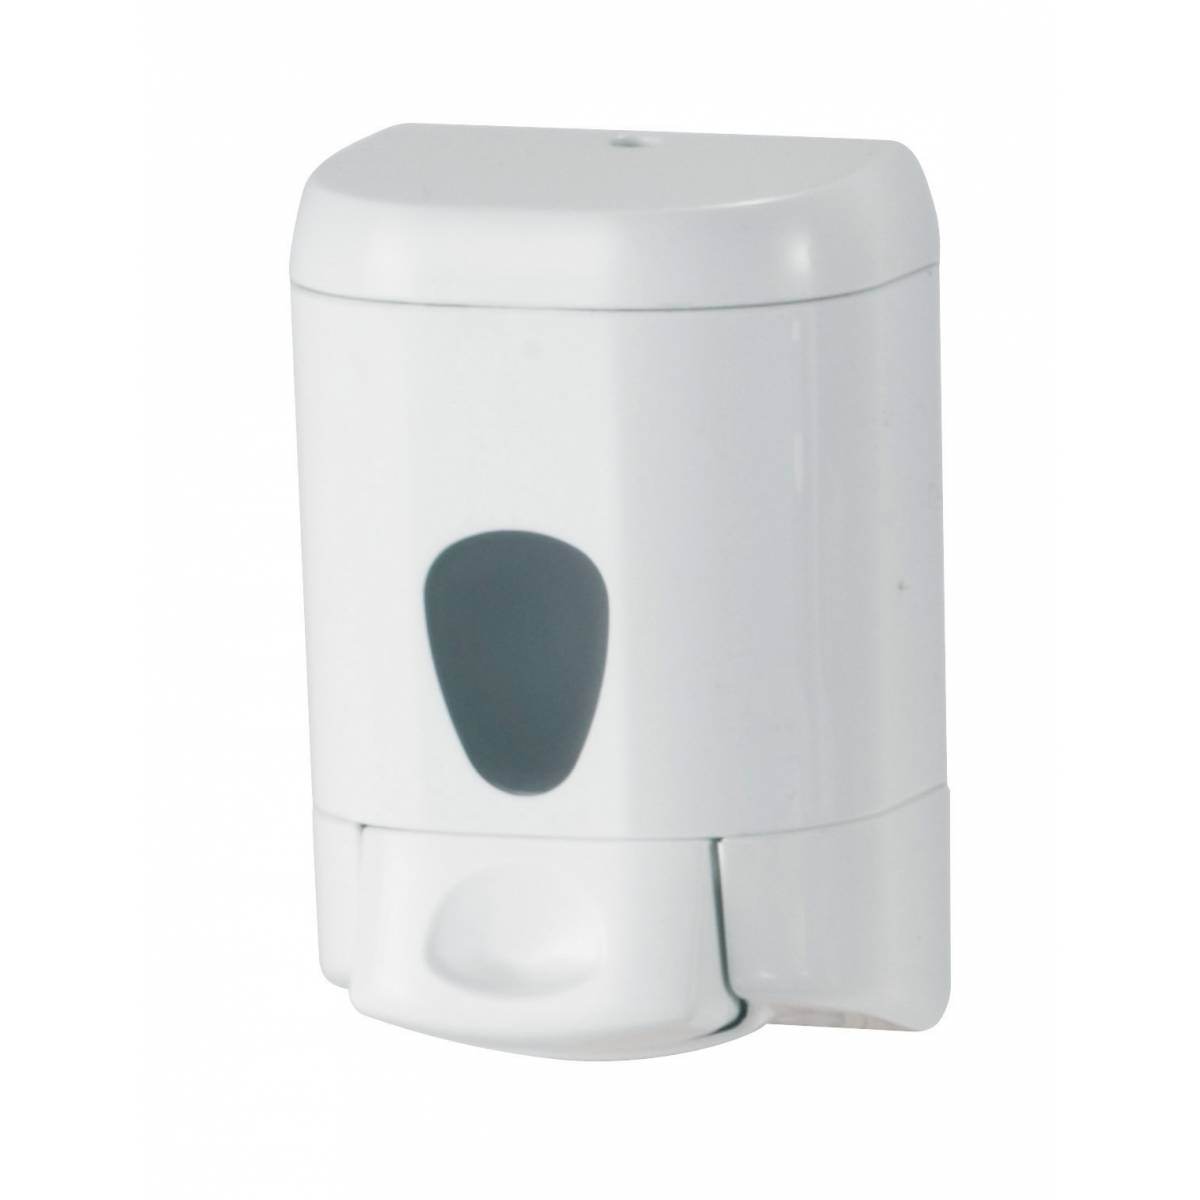 Дозатор жидкого мыла Mar Plast PRESTIGE (775WIN) A77511WIN Mar Plast